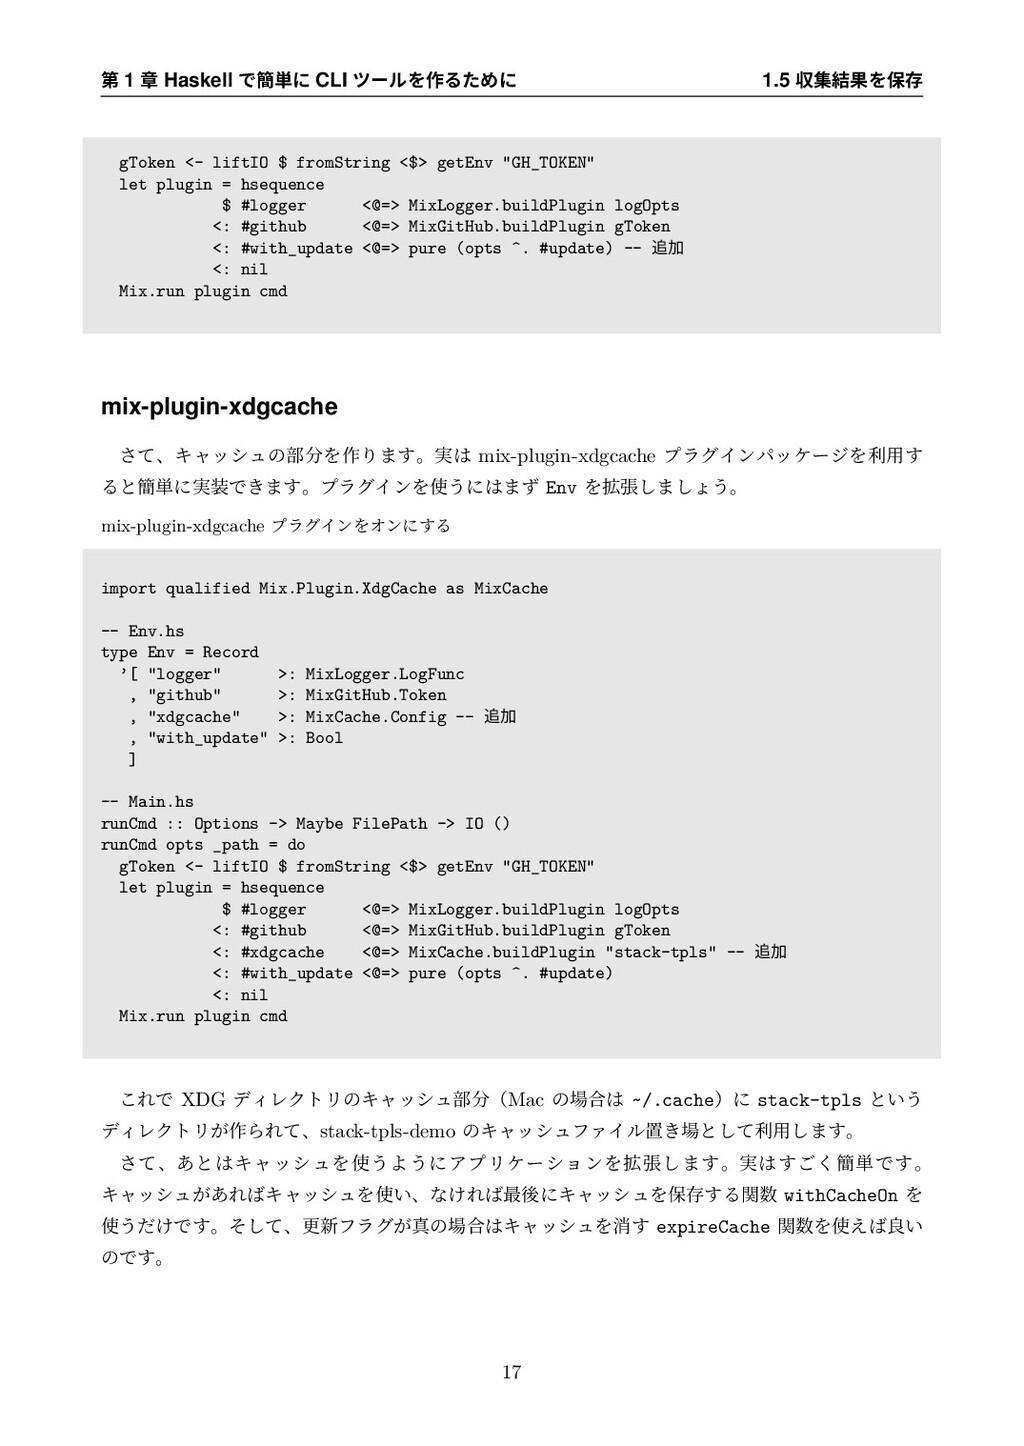 ୈ 1 ষ Haskell Ͱ؆୯ʹ CLI πʔϧΛ࡞ΔͨΊʹ 1.5 ऩू݁ՌΛอଘ gT...